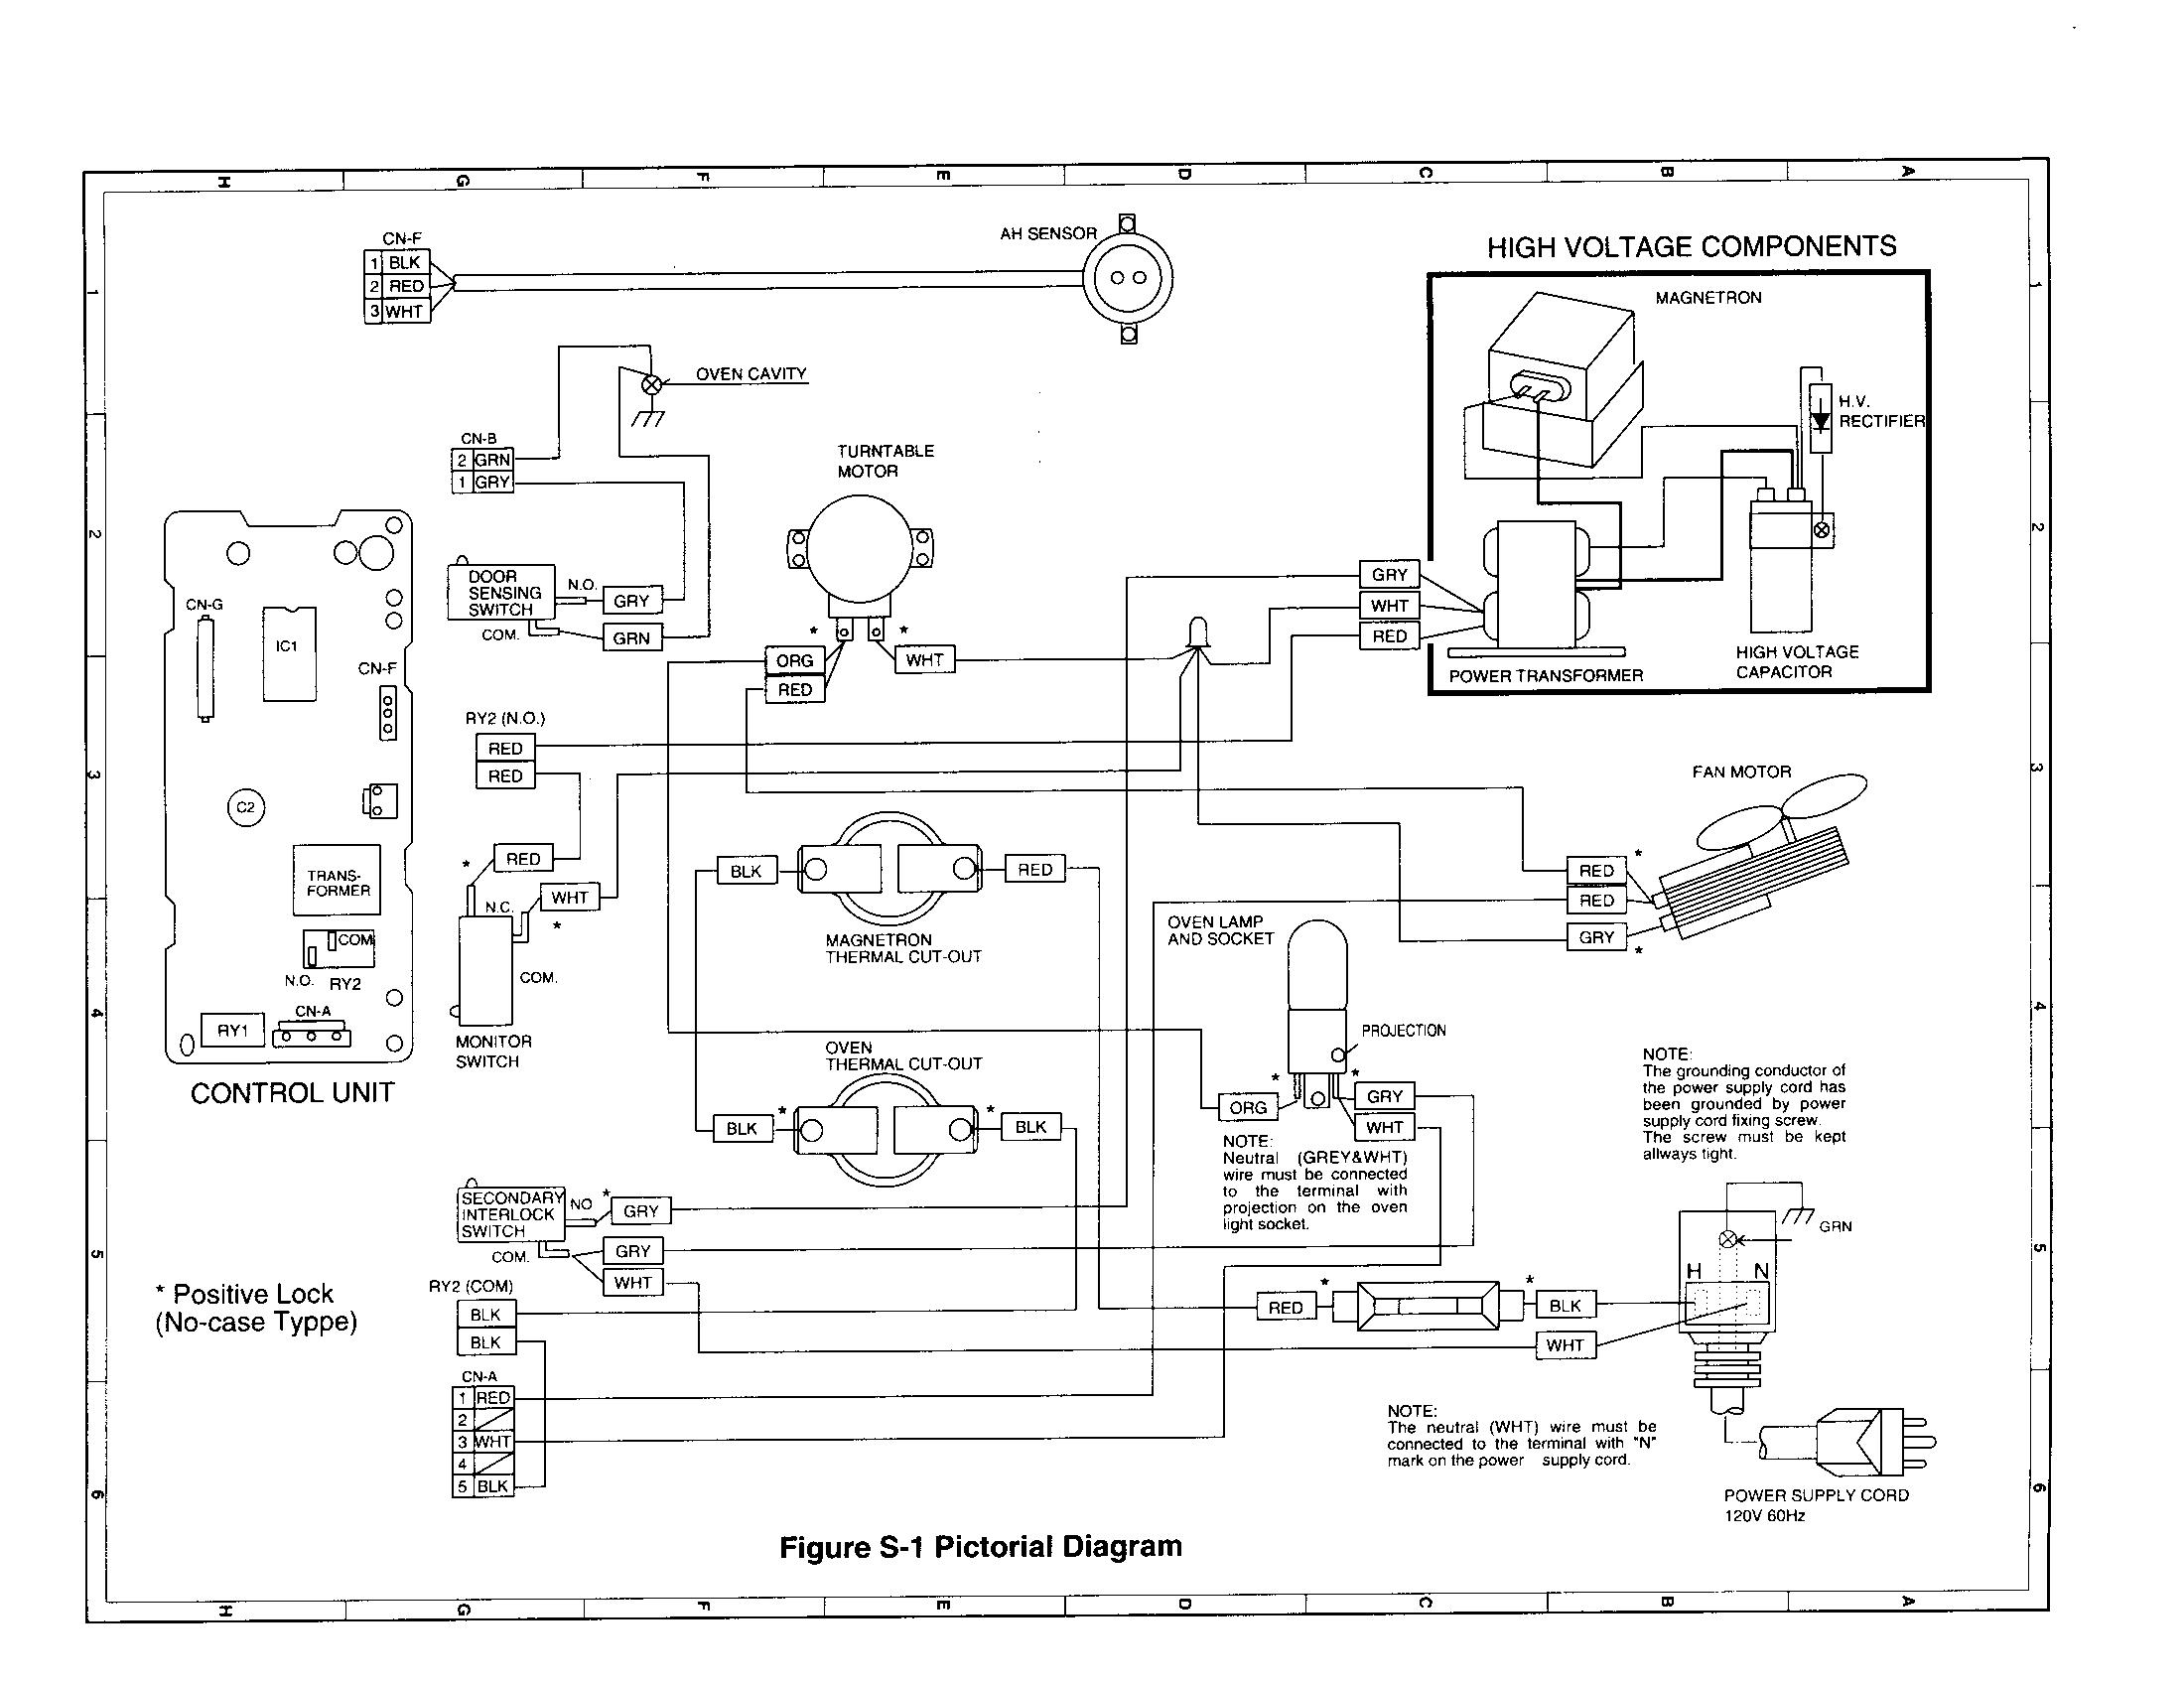 Sharp model R-3H85 countertop microwave genuine parts